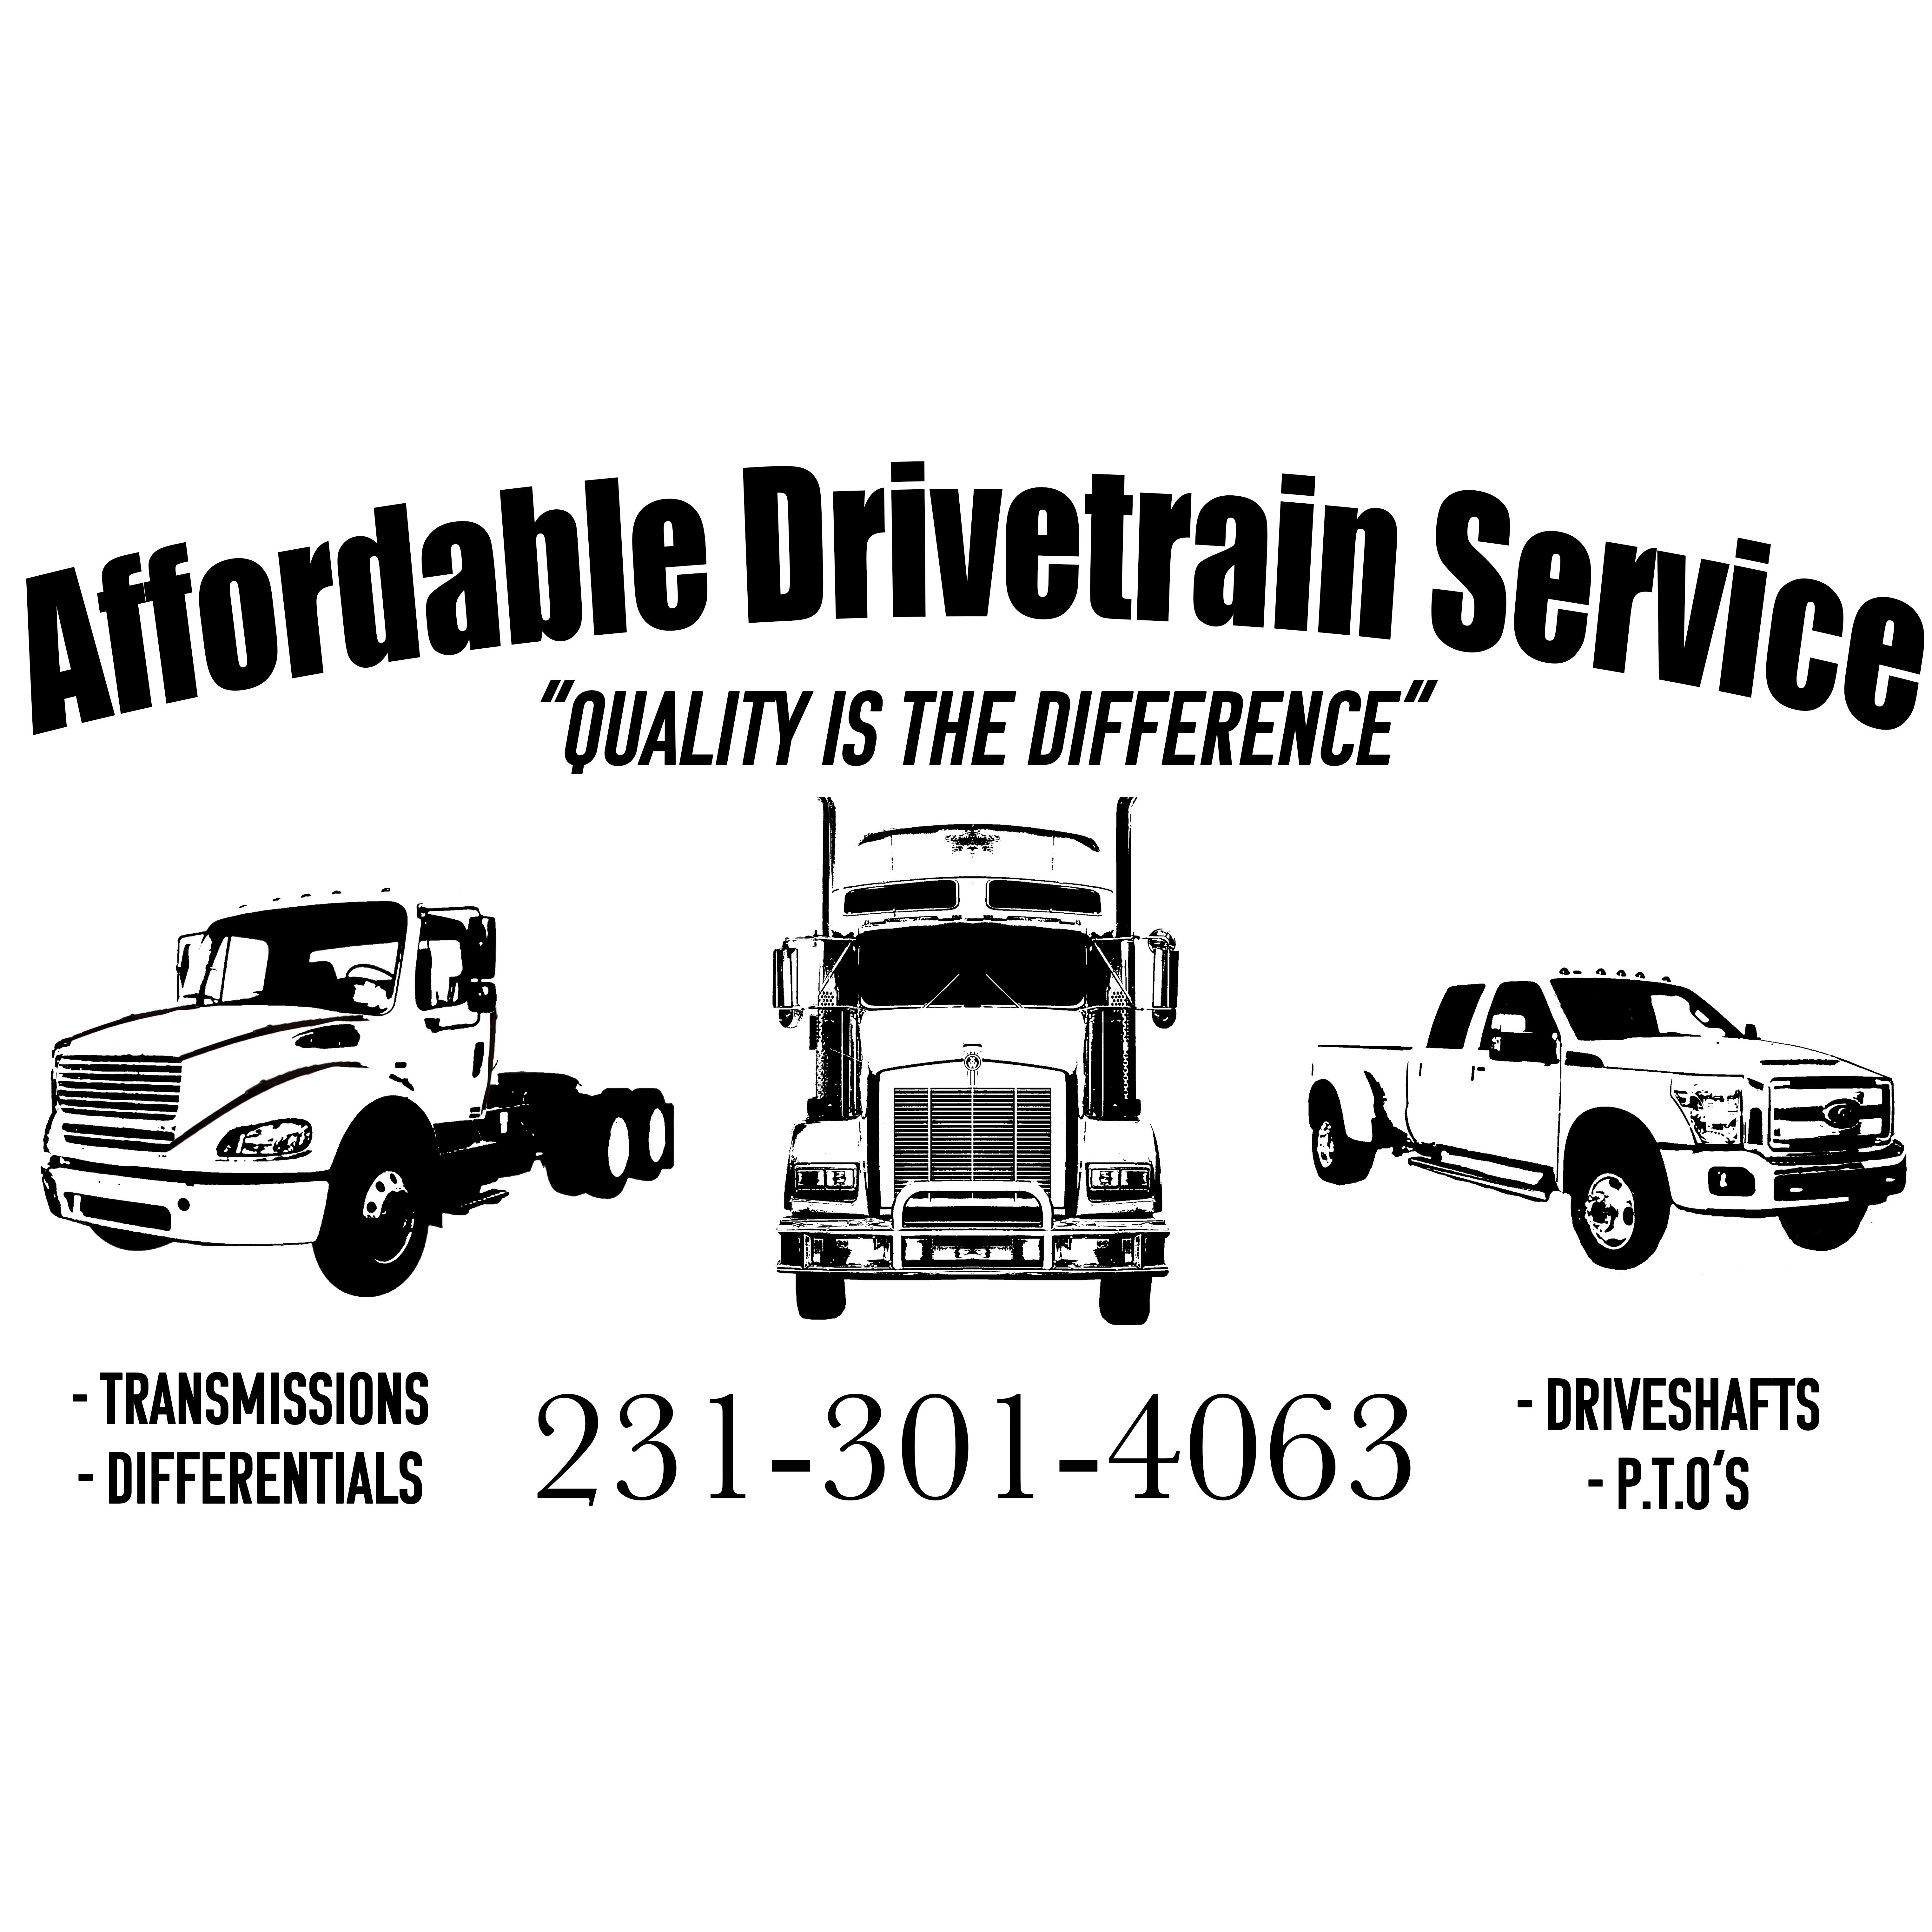 Affordable Drivetrain Service